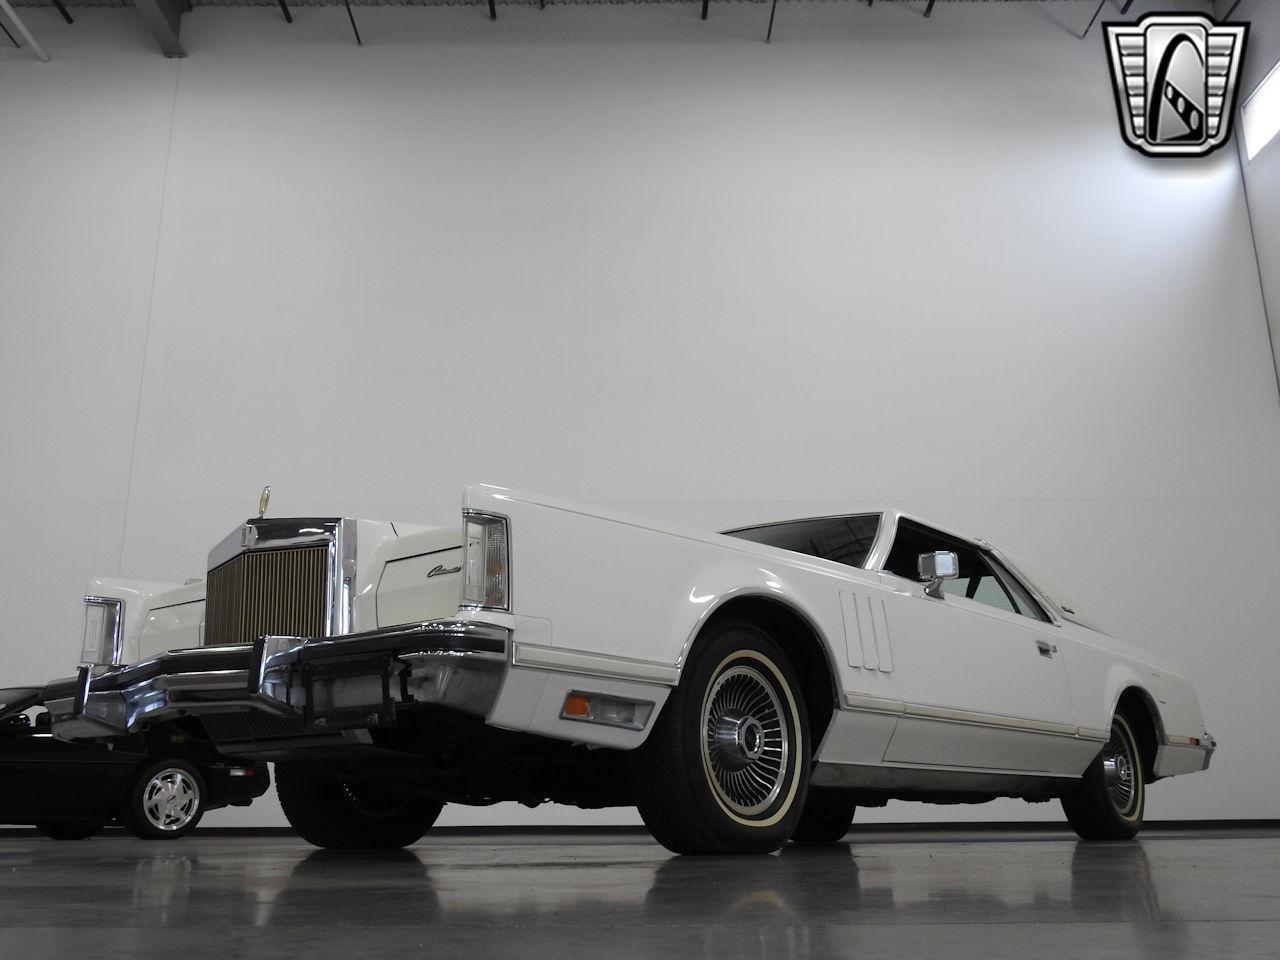 1979 Lincoln MKV 25